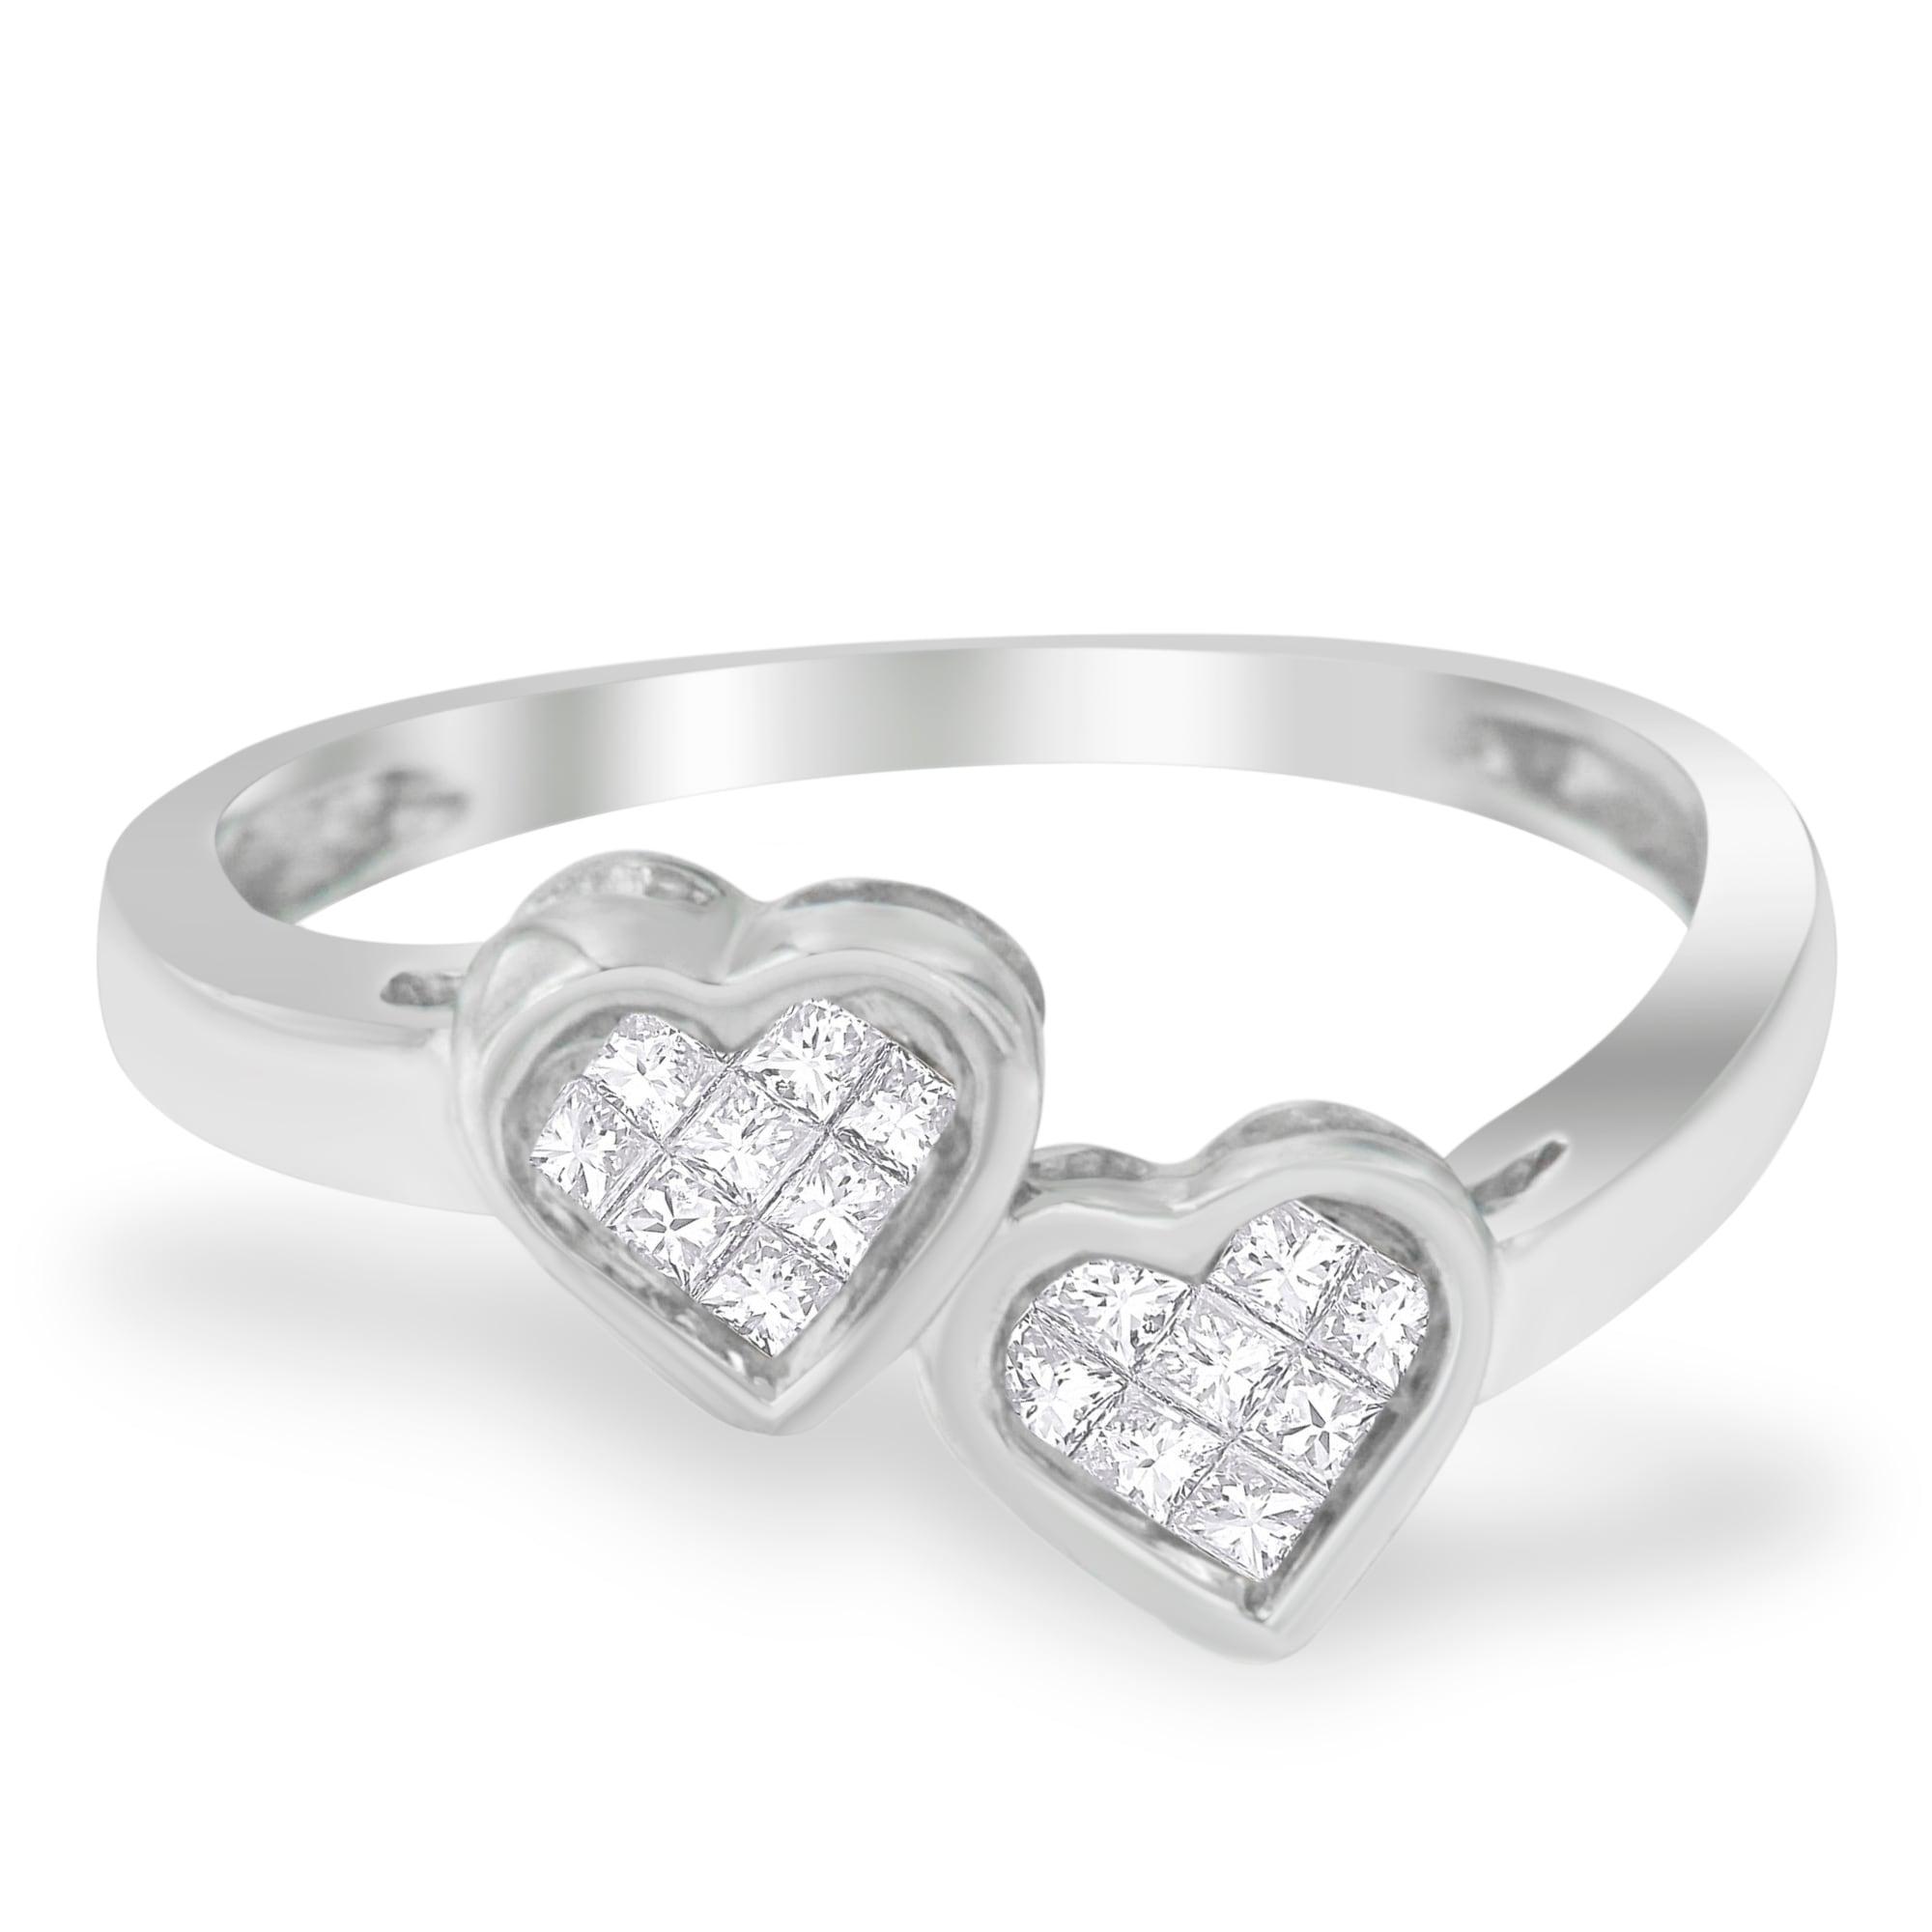 1a07292afef7da 10k White Gold 1/4ct. TDW Princess Cut Diamond Heart Promise Ring  (H-I,SI2-I1)